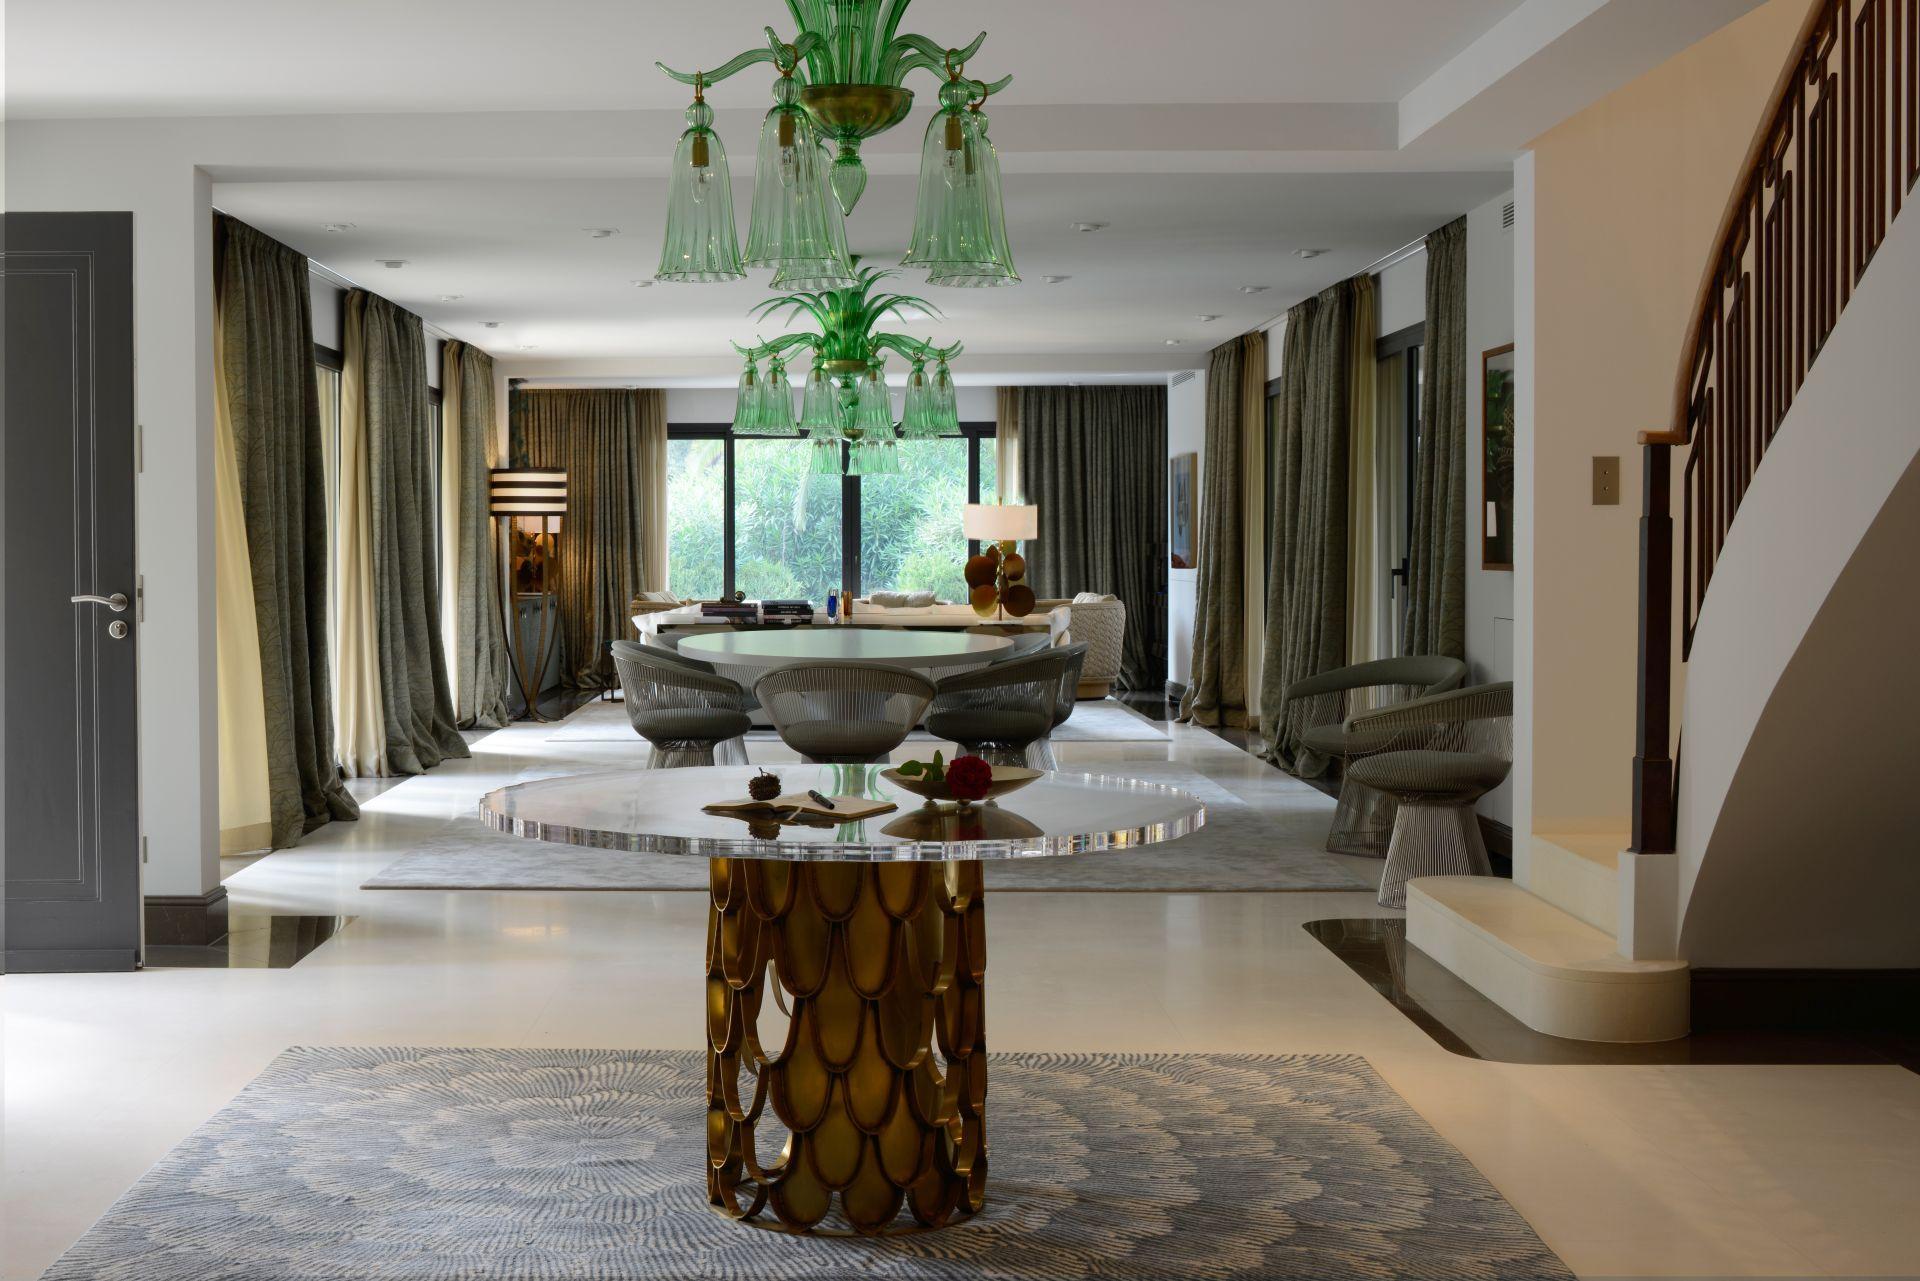 Interior Design By Davide Rizzo In South France